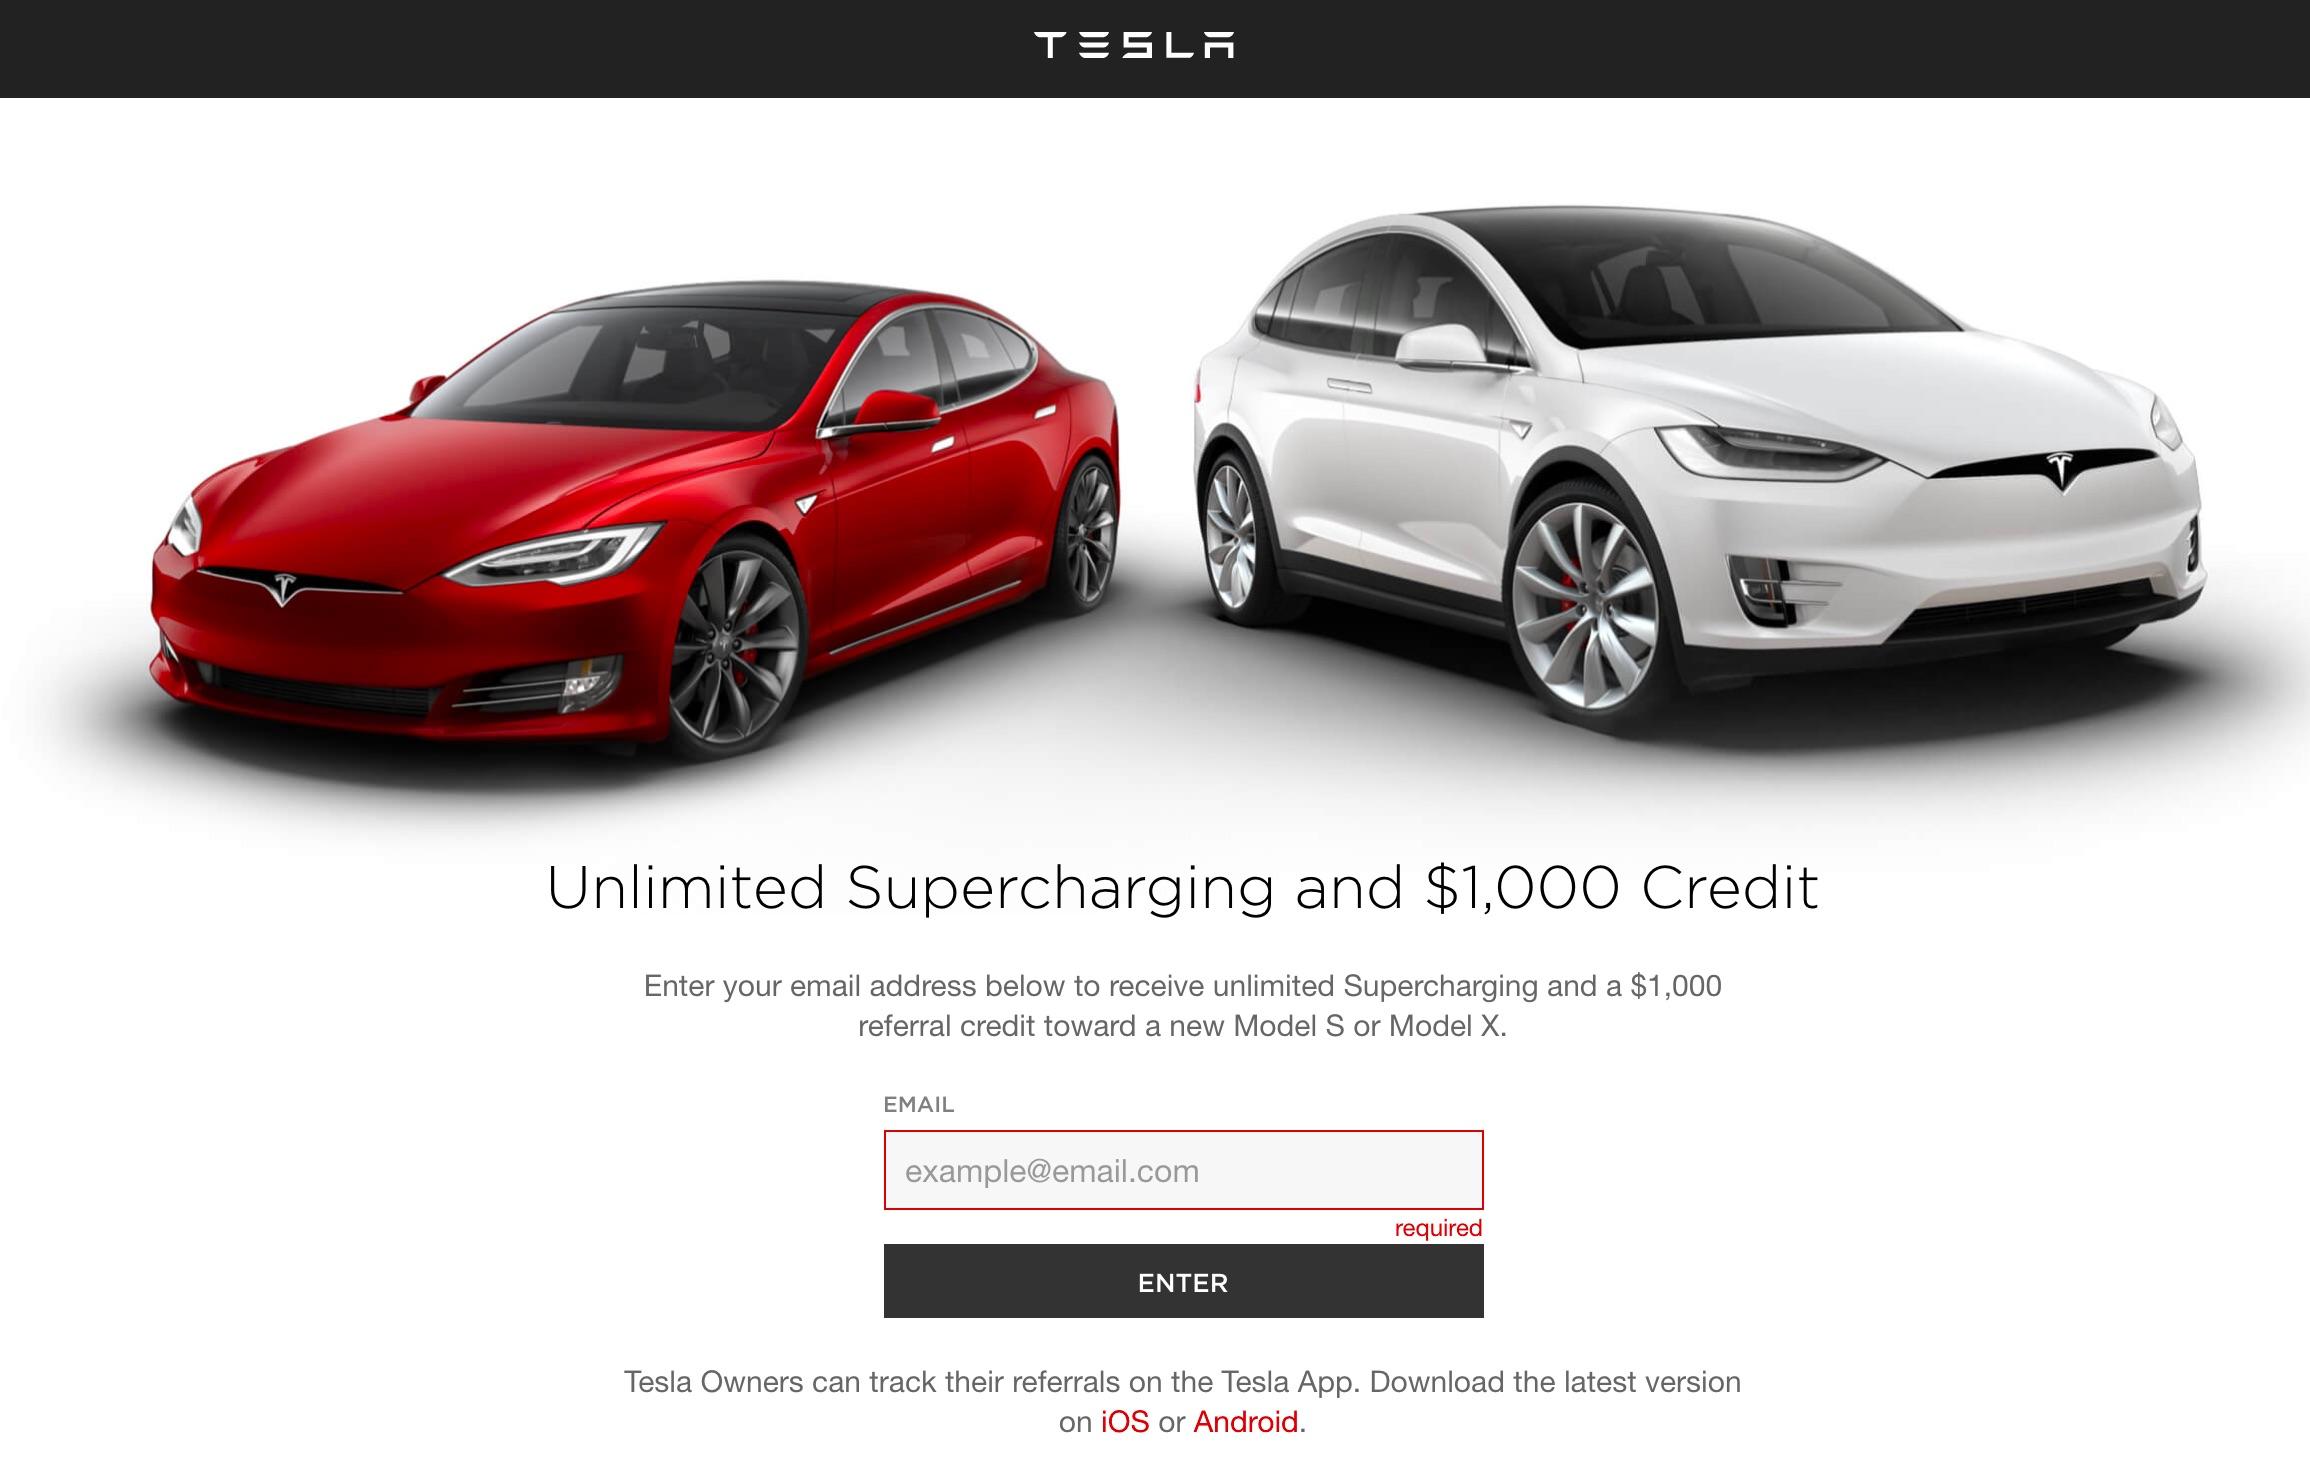 Tesla Referral Program crackdown: Musk to